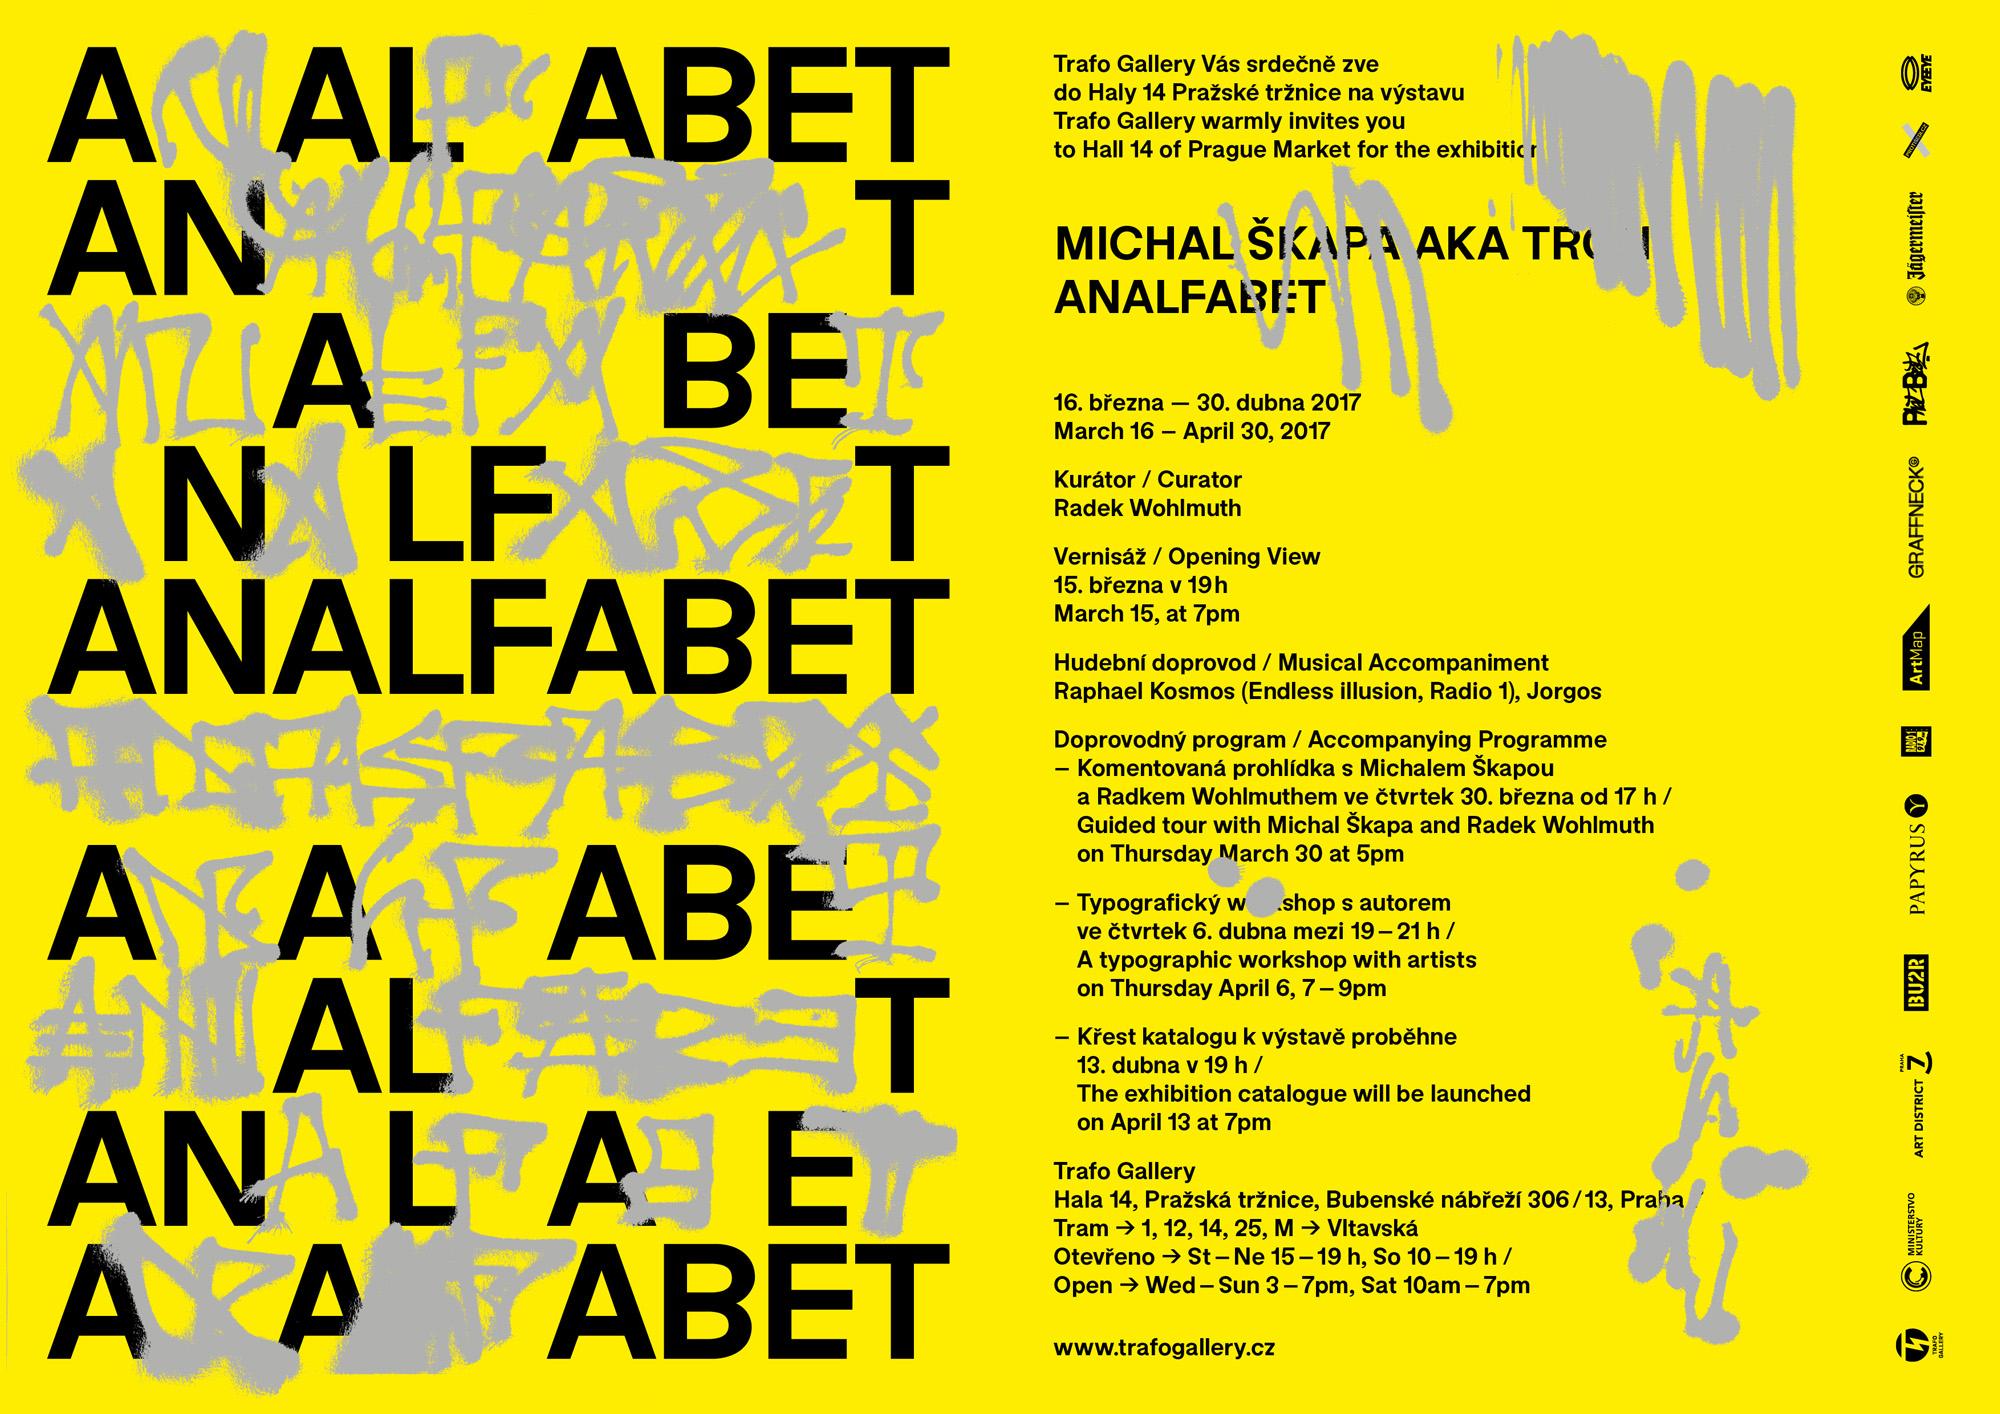 Michal Škapa aka TRON - ANALFABET